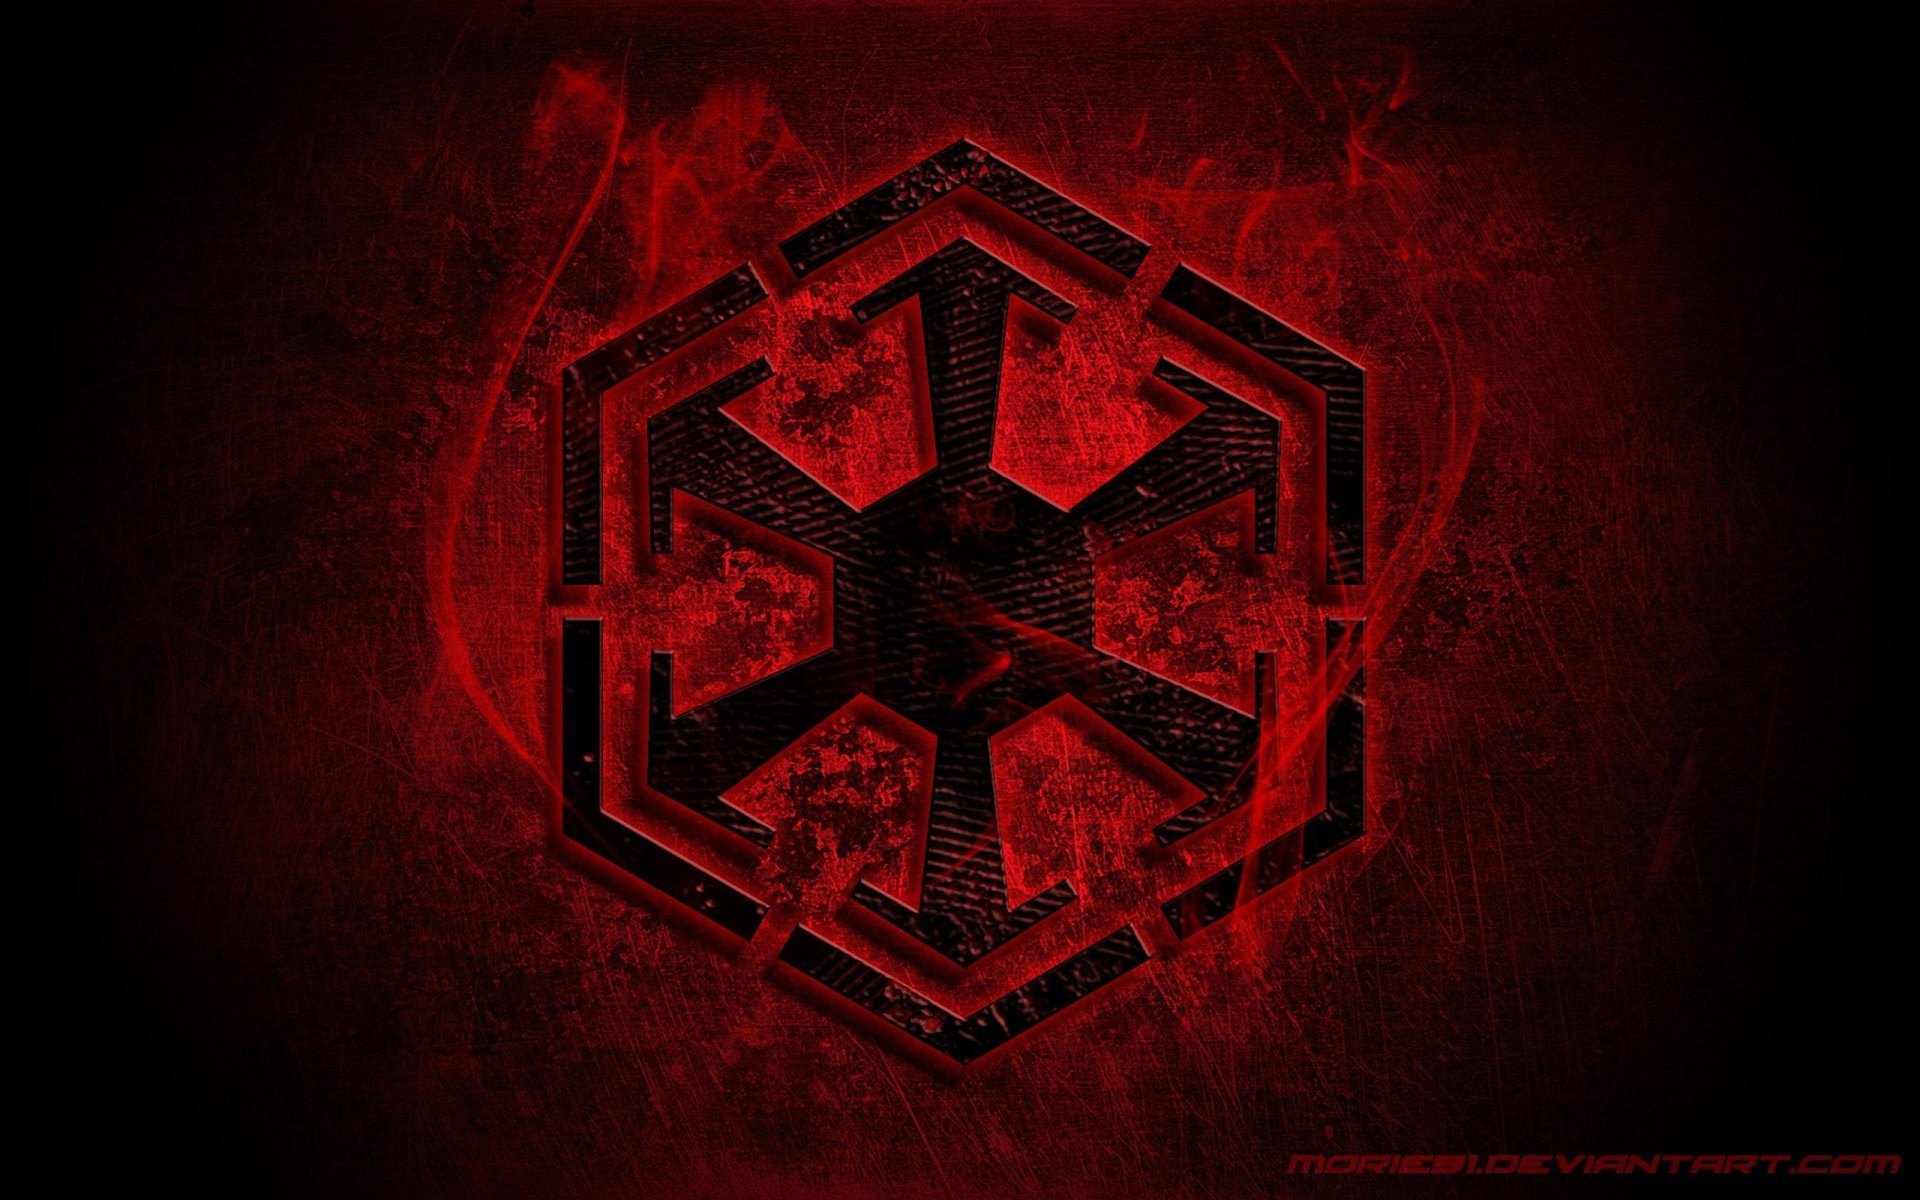 Star-wars-the-old-republic-Sith-logo wallpaper | 1920x1200 ...